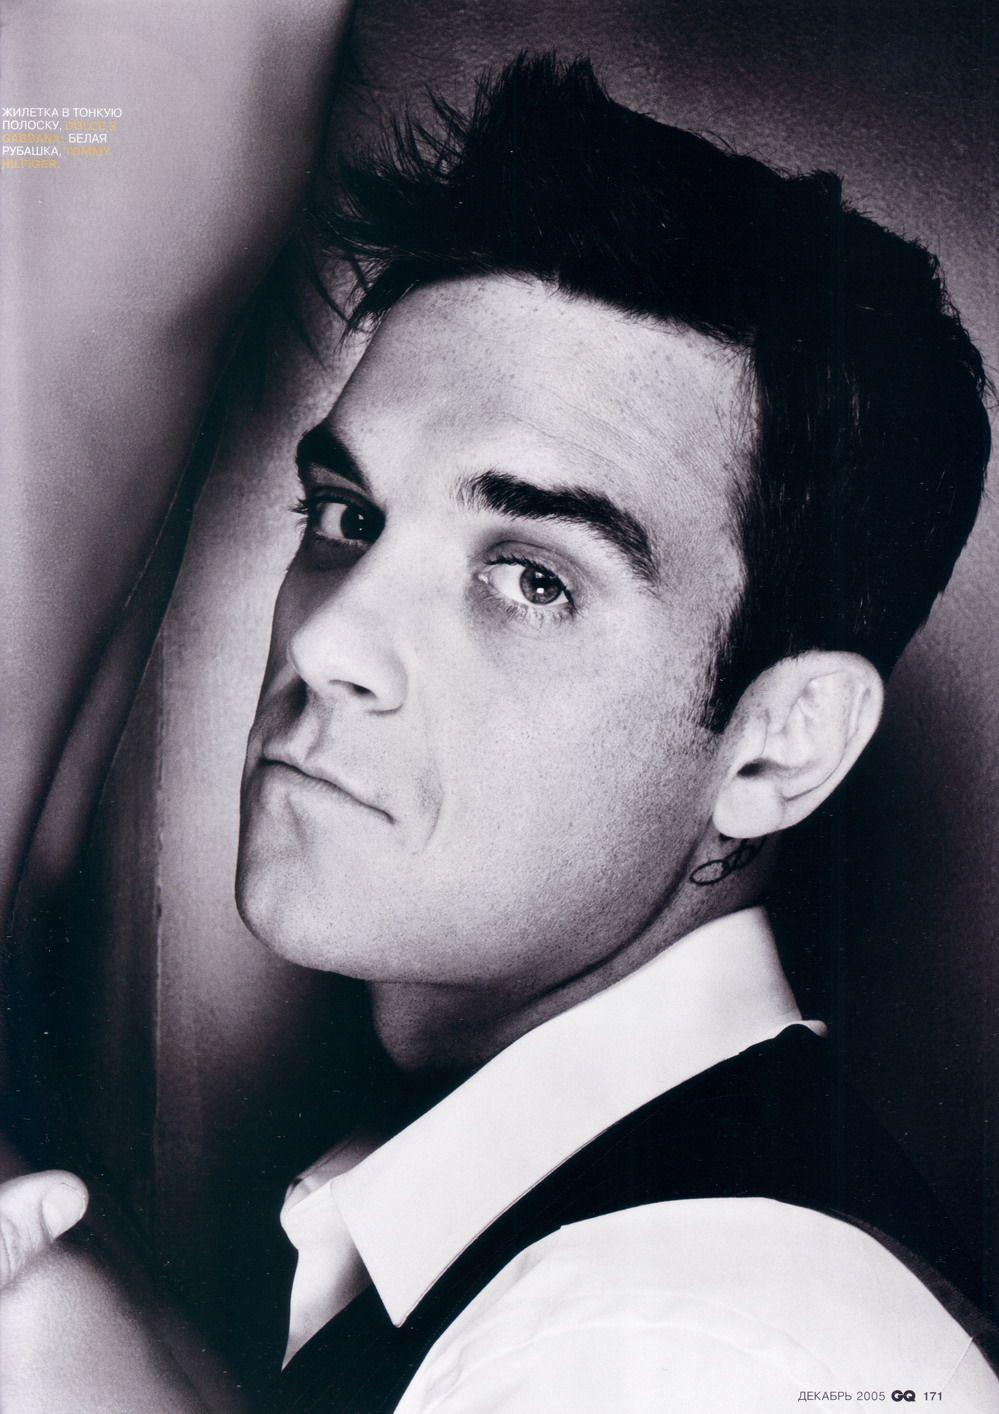 Robbie Williams, oh I've missed his face!